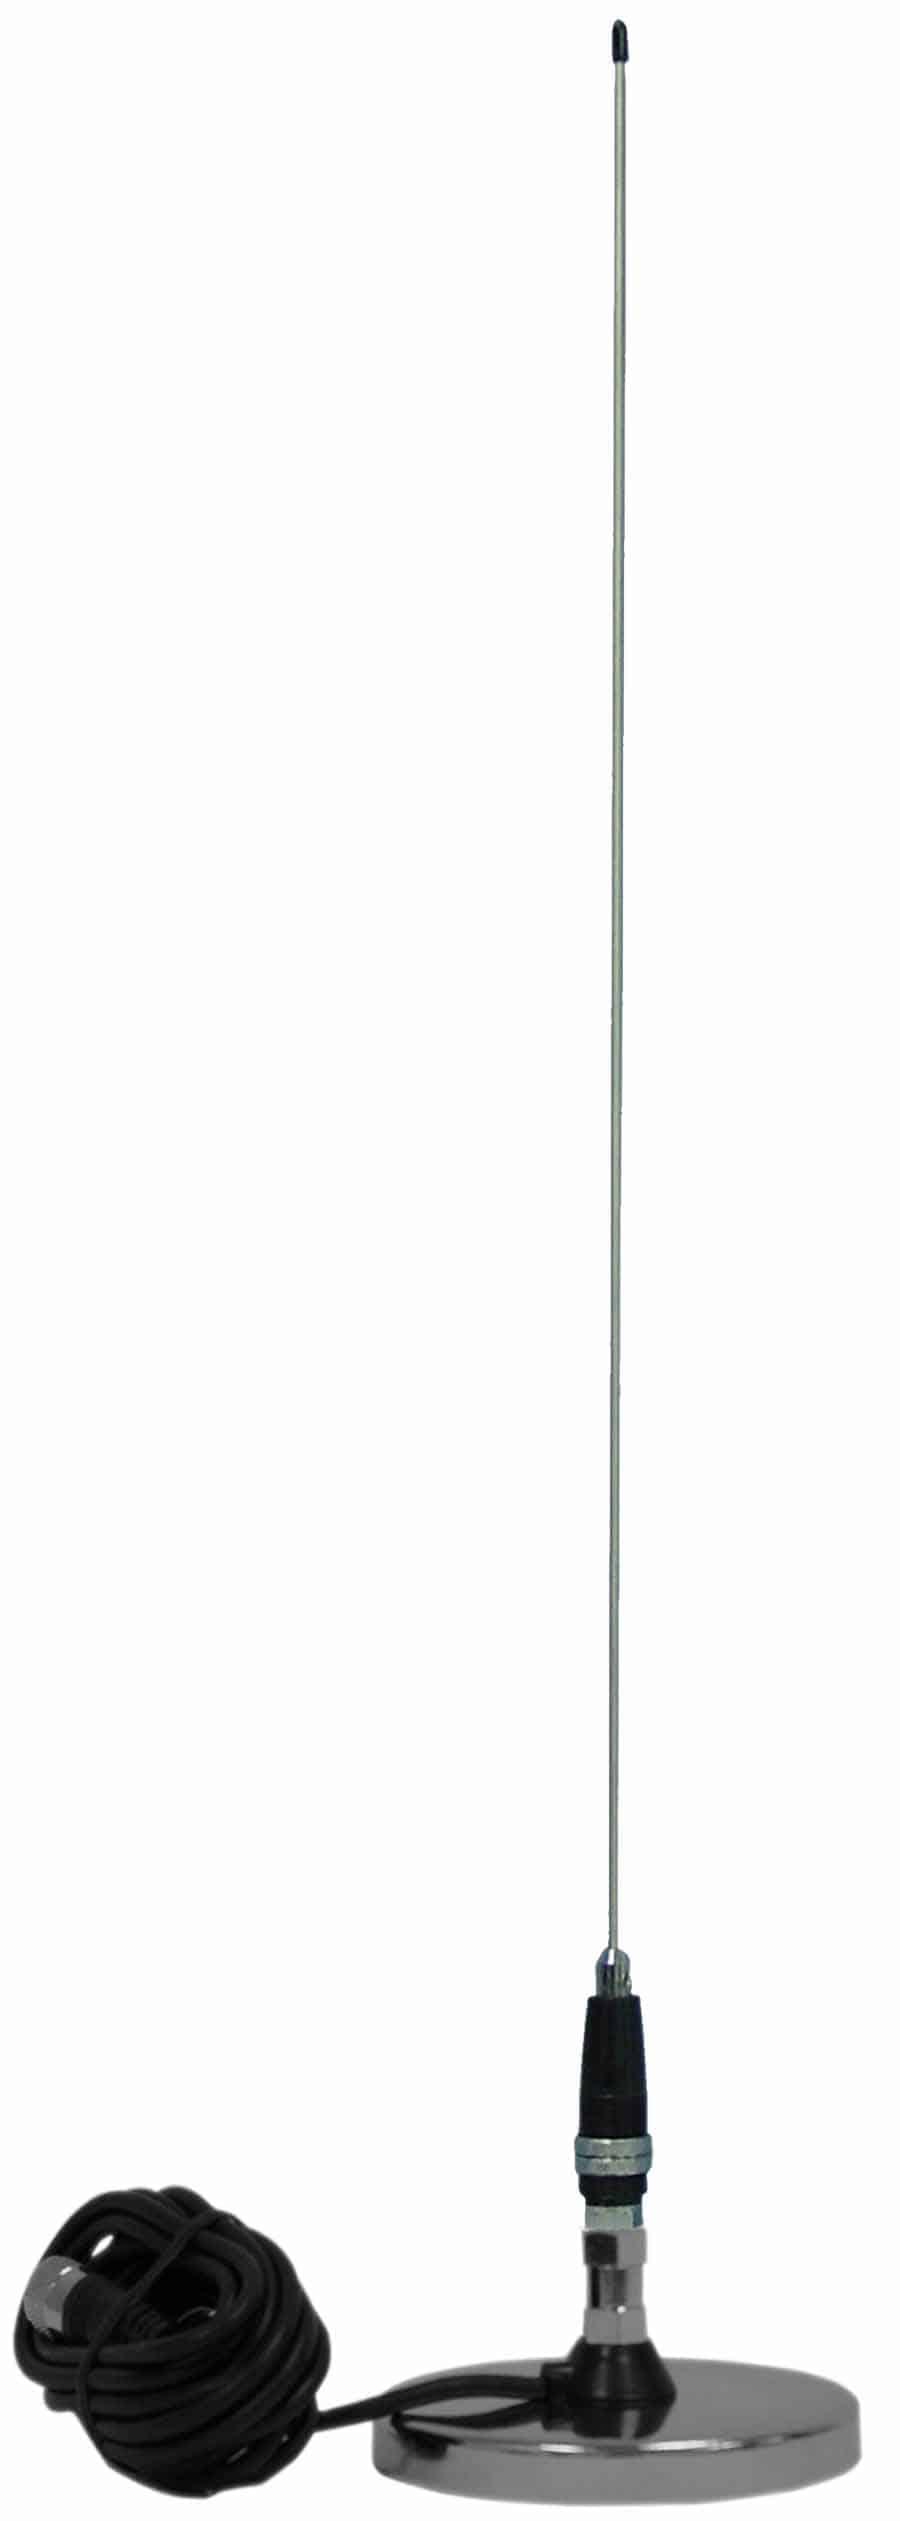 "JBC112-3600 - ProComm 36"" Dial-A-Match Antenna w/3"" Magnet & 12' Coax"